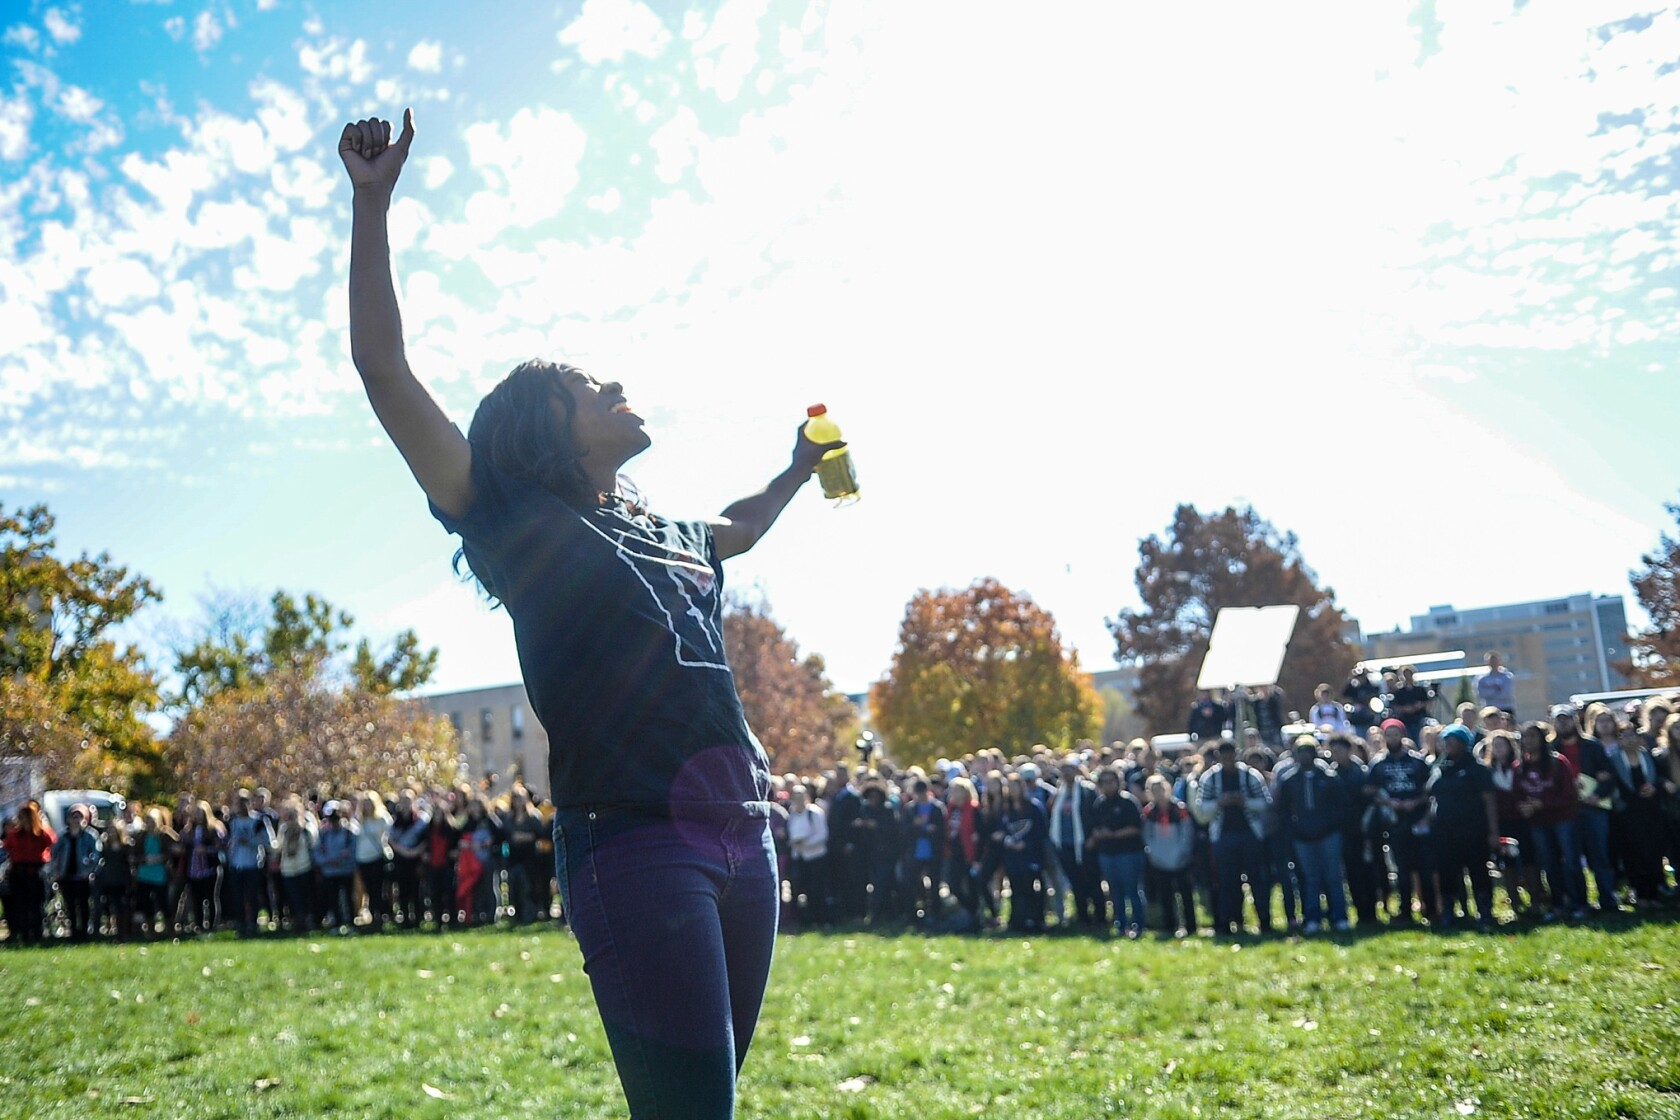 University of Missouri names black administrator with civil